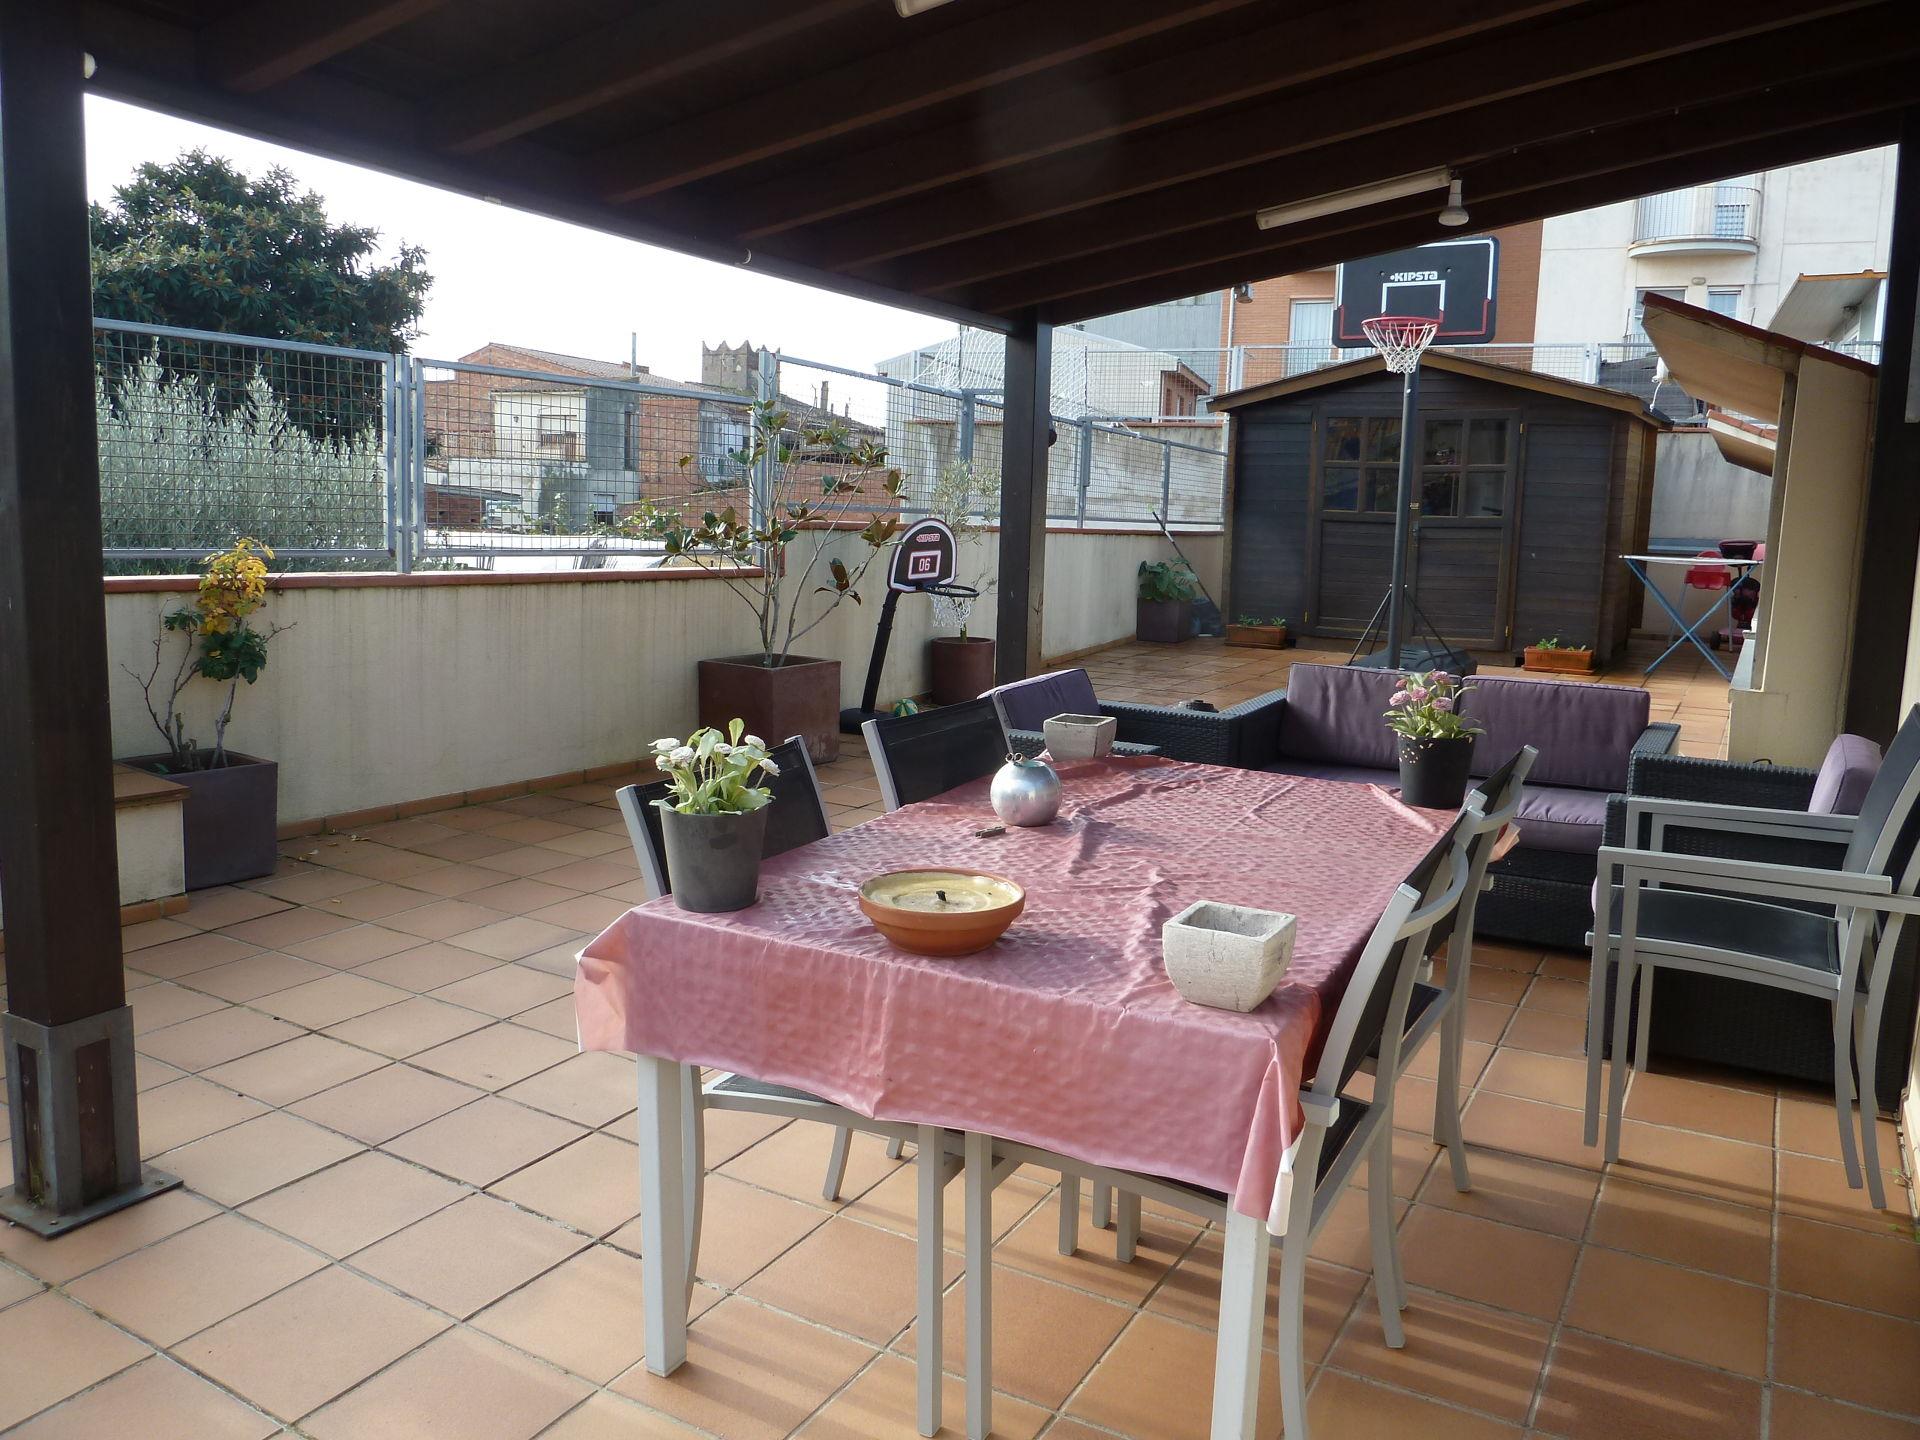 Dúplex amb terrassa de 100 m2